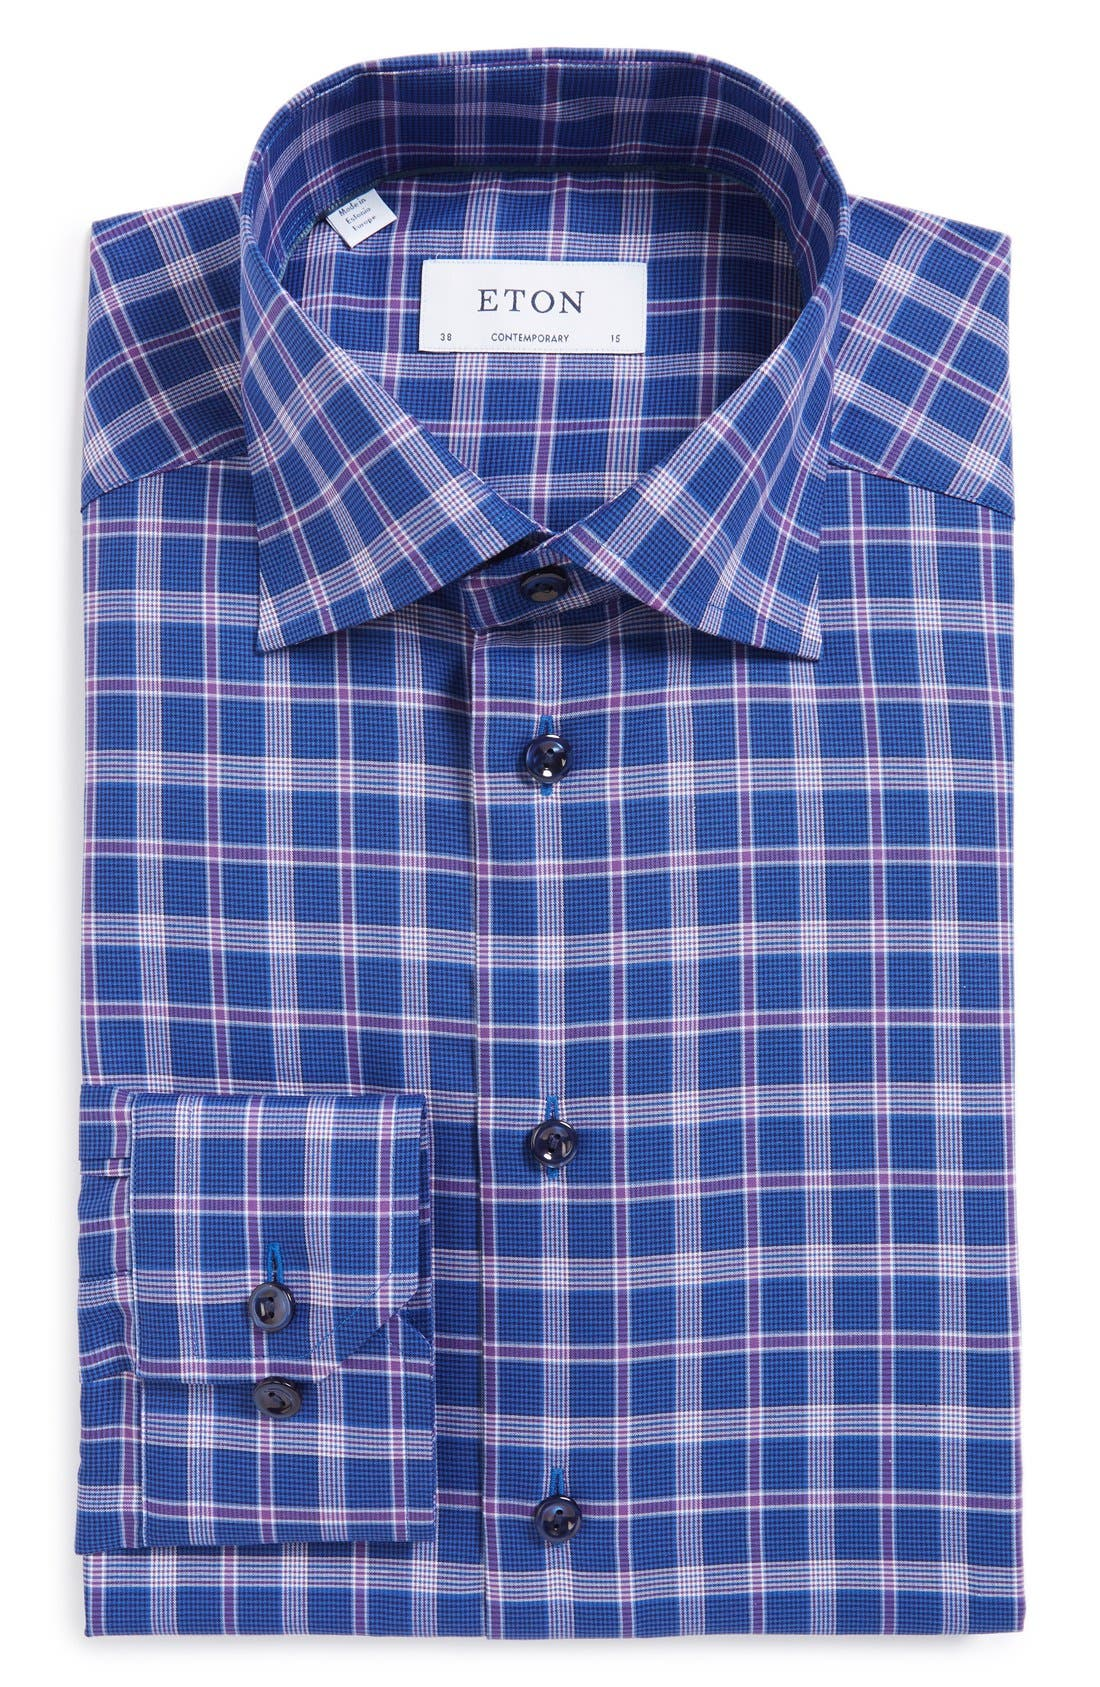 ETON,                             Contemporary Fit Plaid Dress Shirt,                             Main thumbnail 1, color,                             500